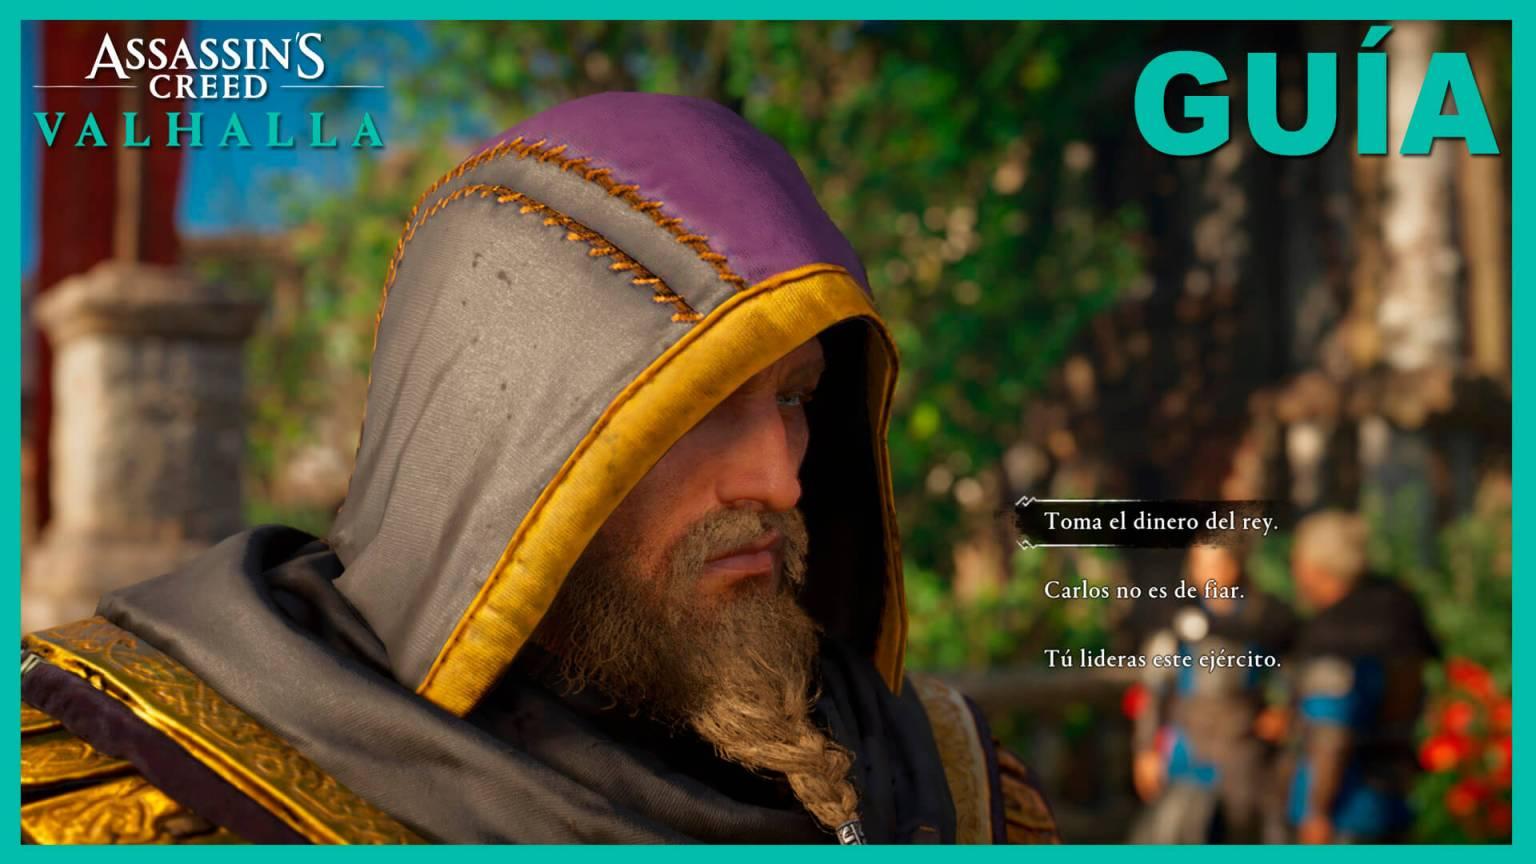 Assassin's Creed Valhalla dinerodel rey